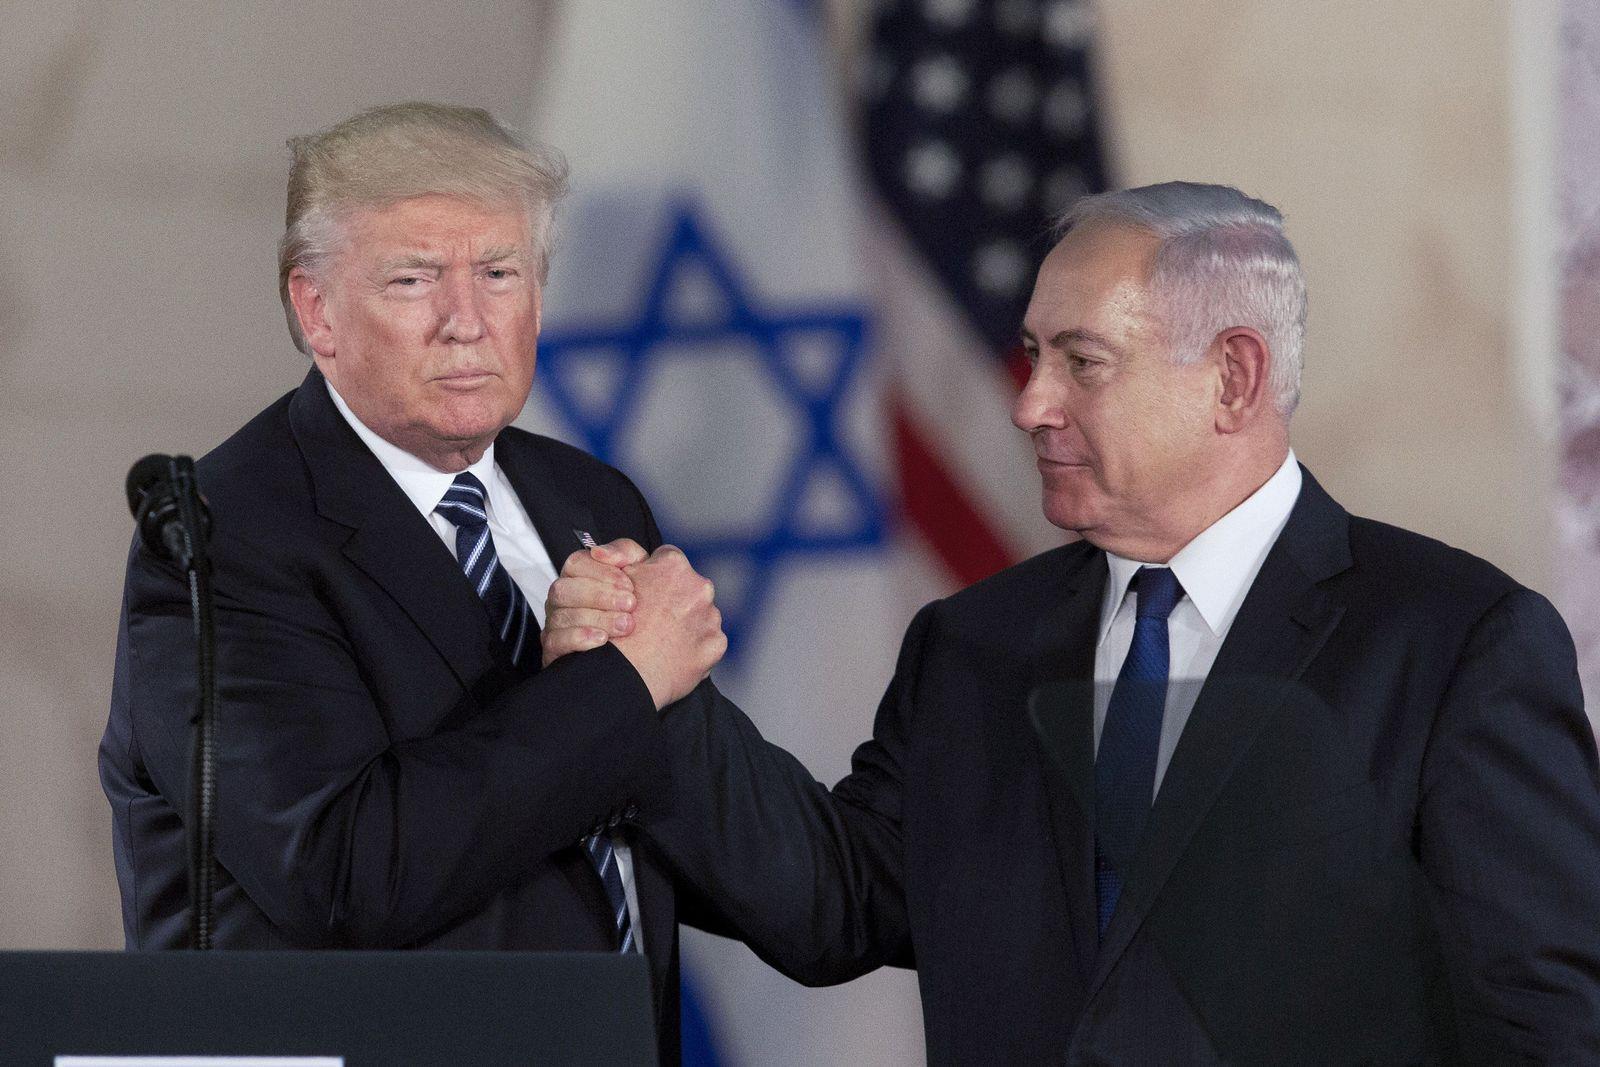 Donald Trump / Reise / Jerusalem